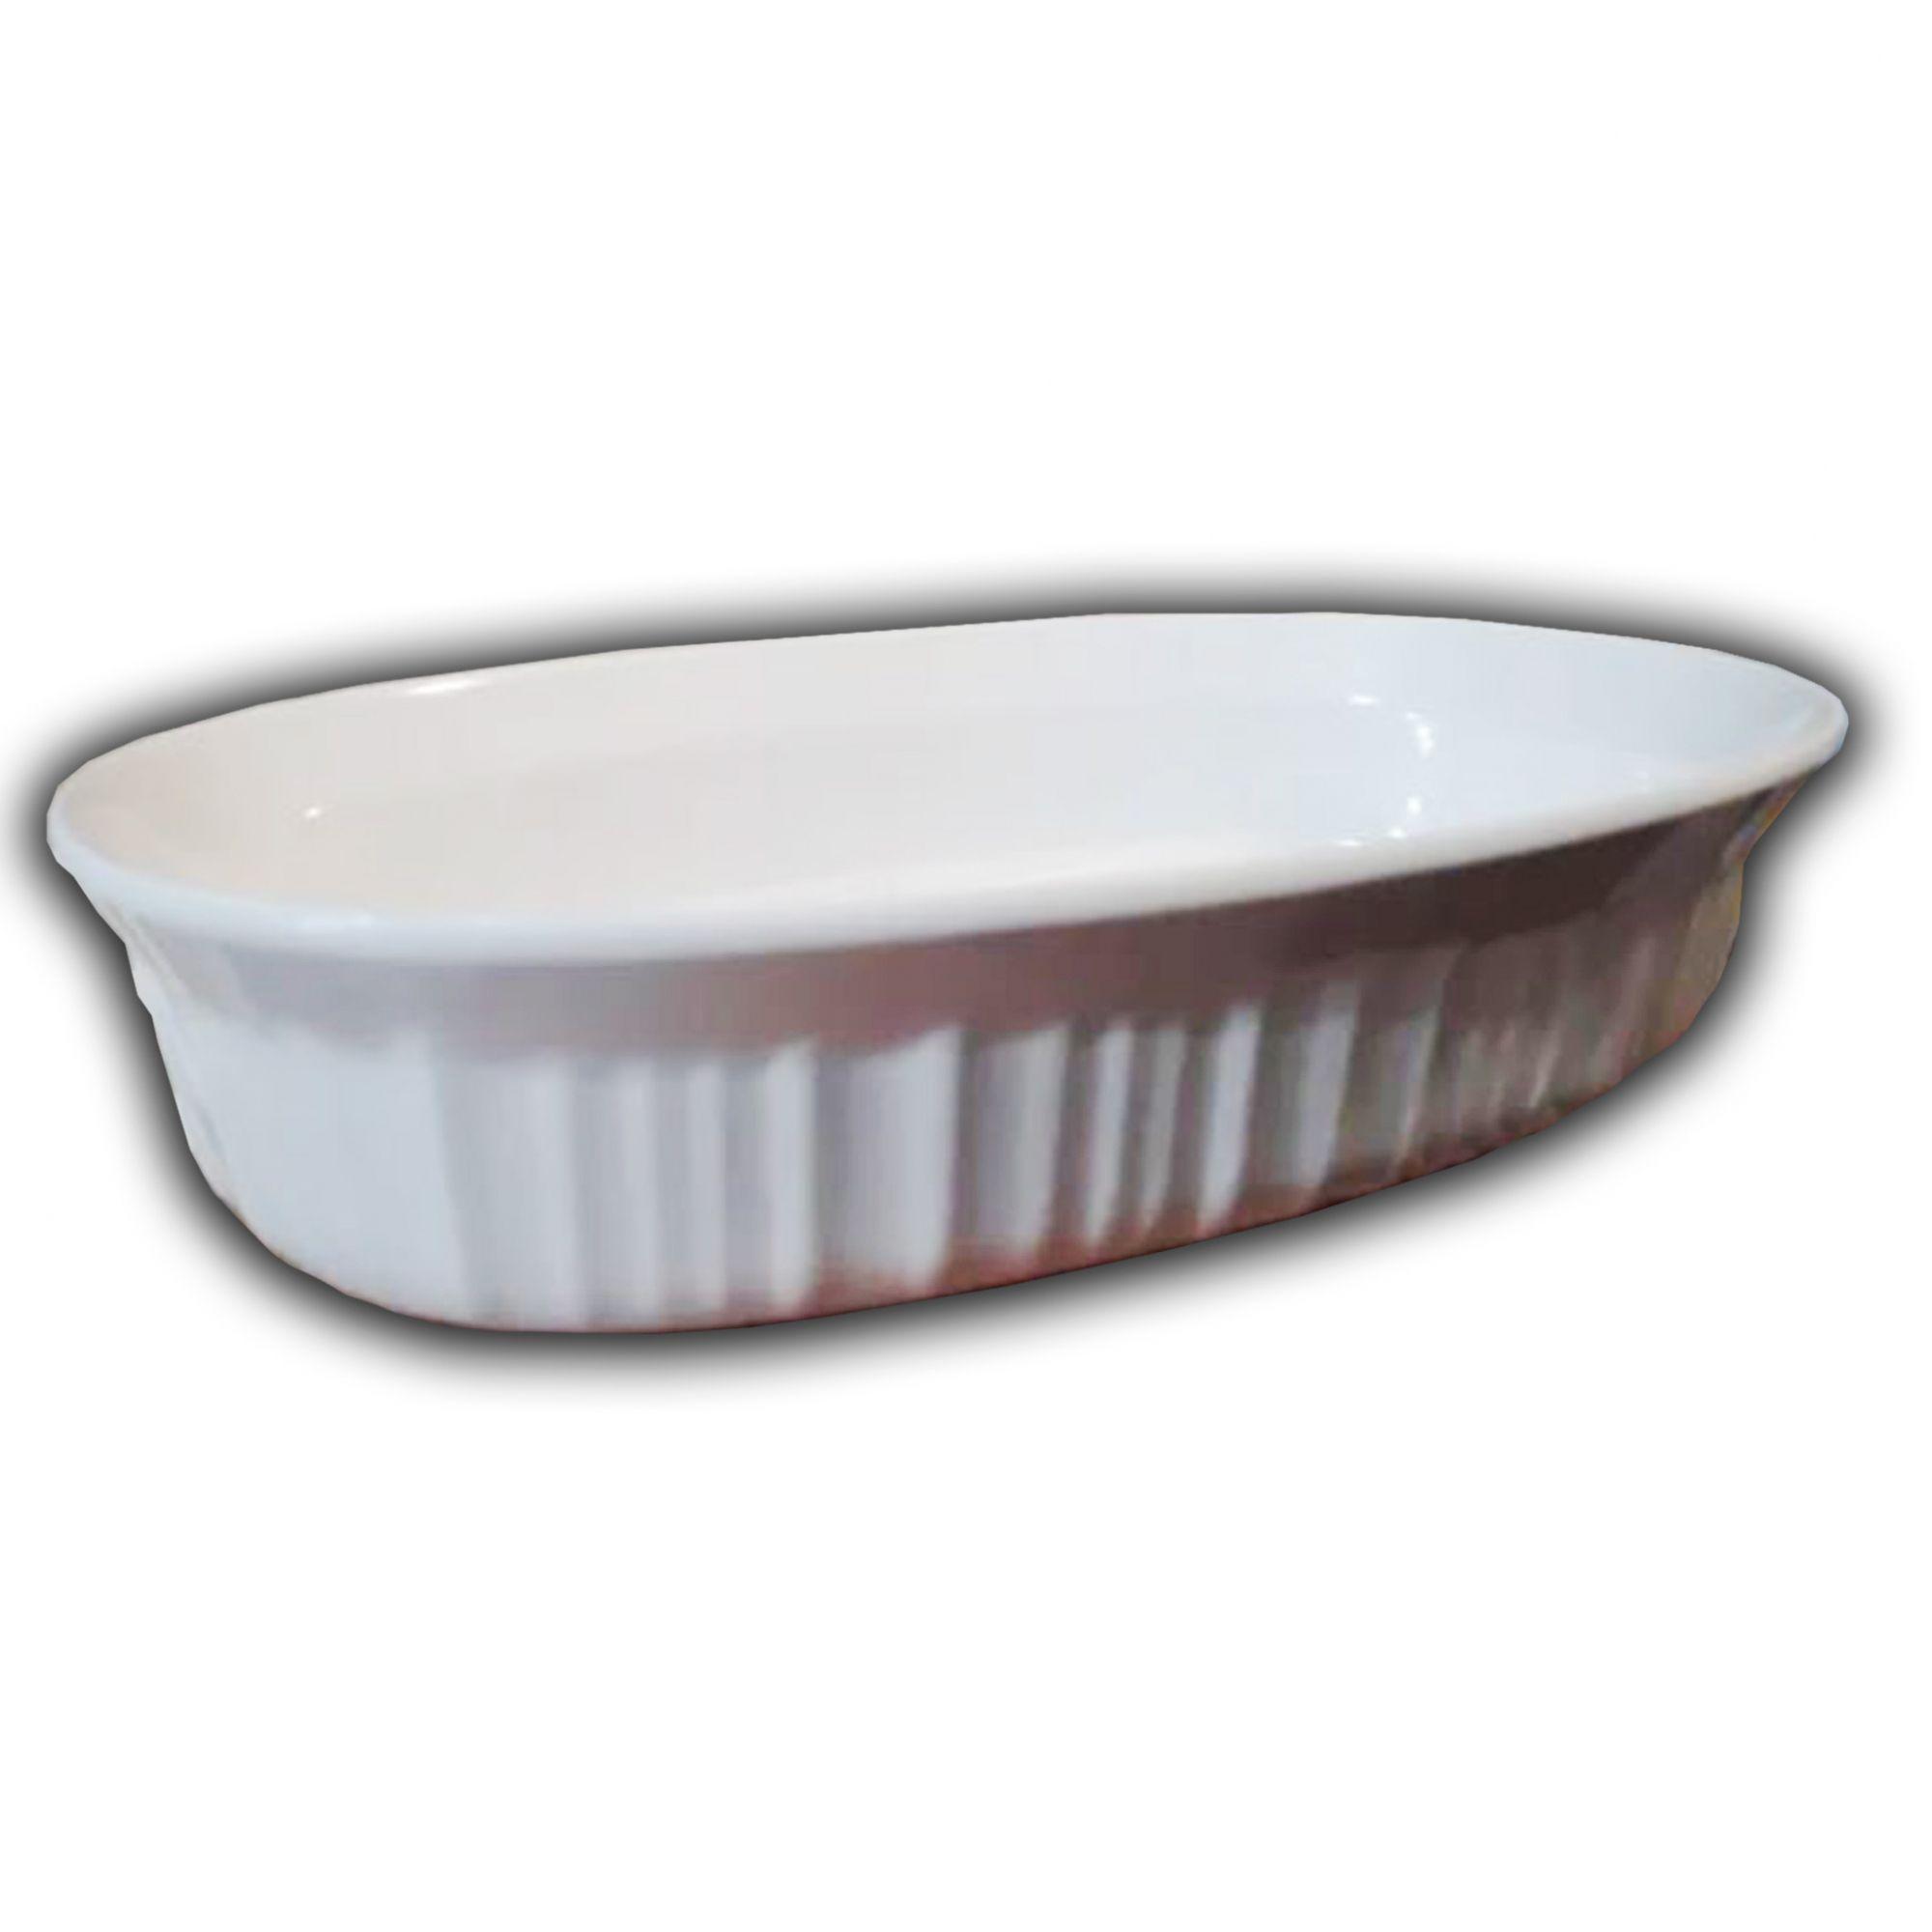 Travesa saladeira Retangular 28X18